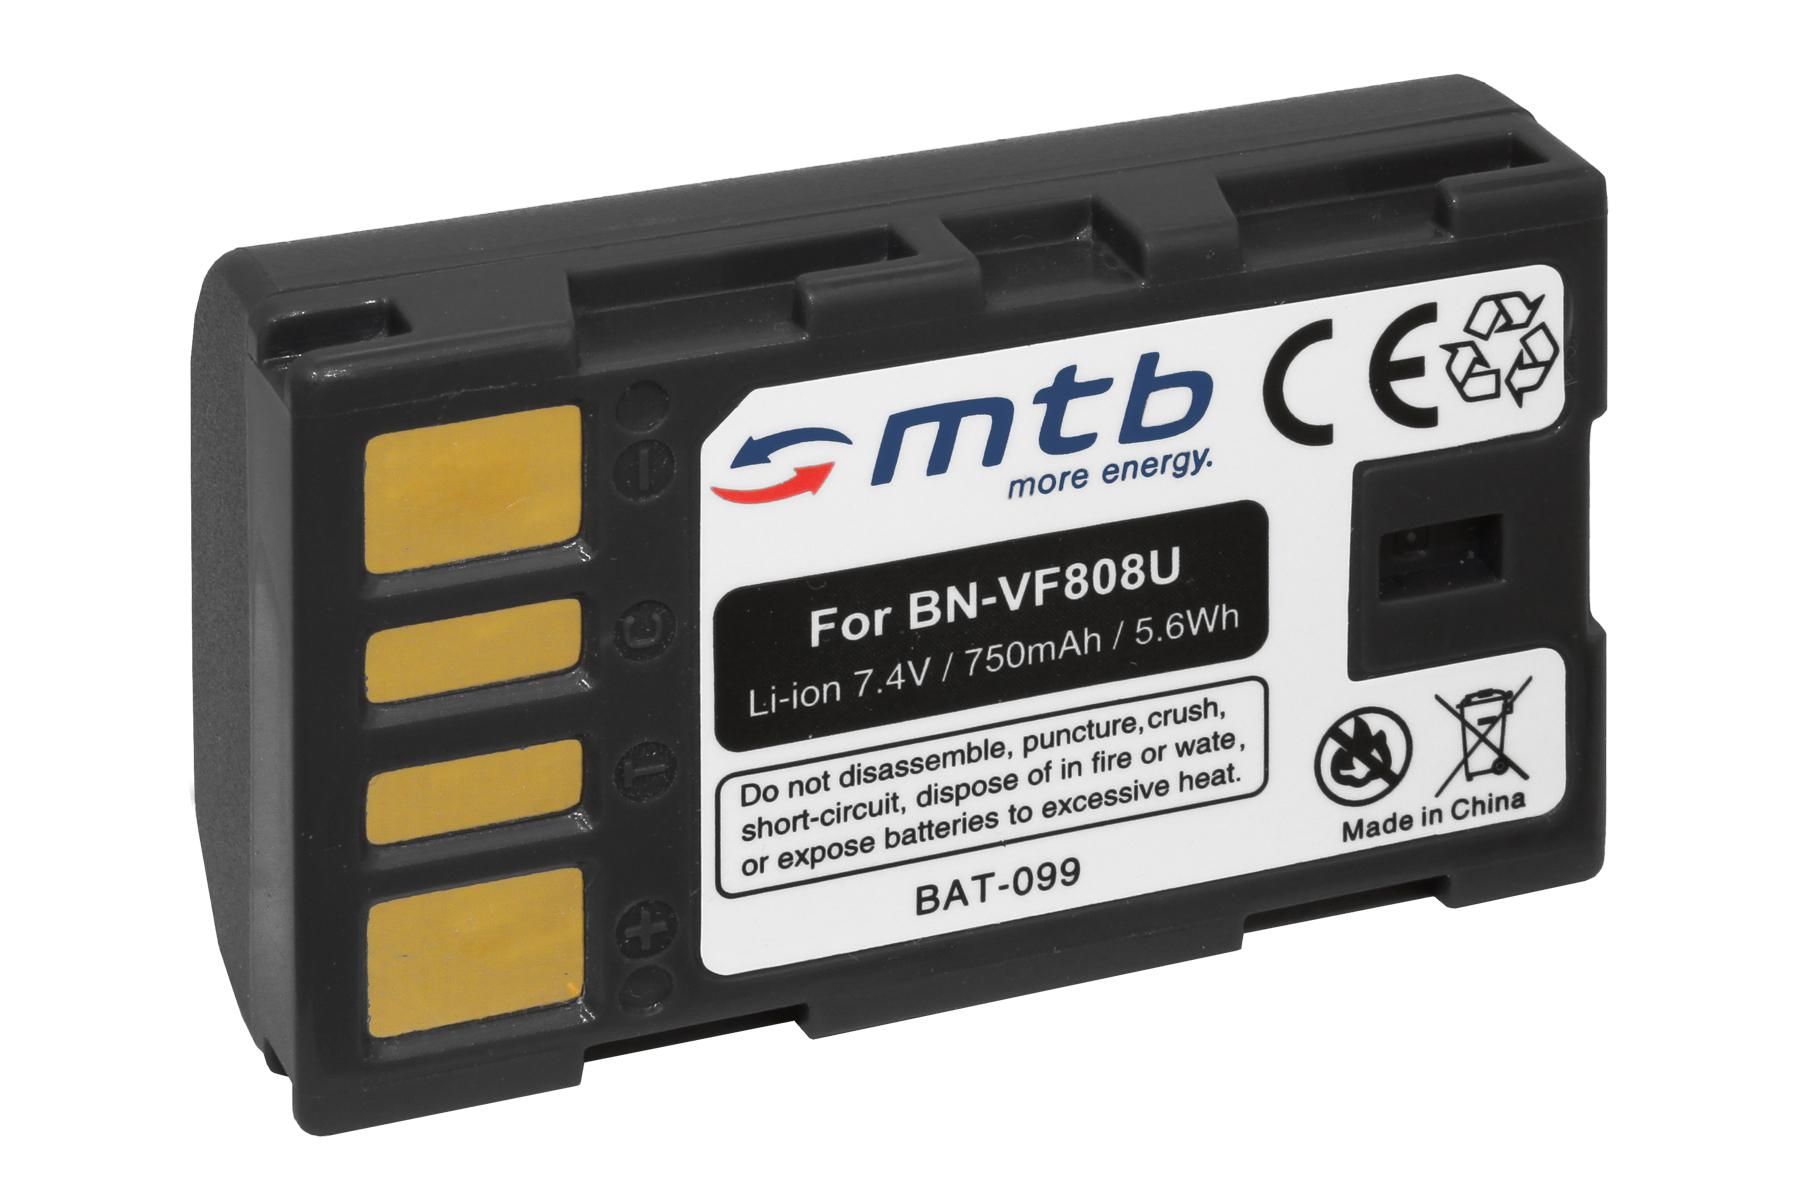 D725 Batería BN-VF808 D740 D750 D726 D727 VF808U para JVC GR-D720 D721